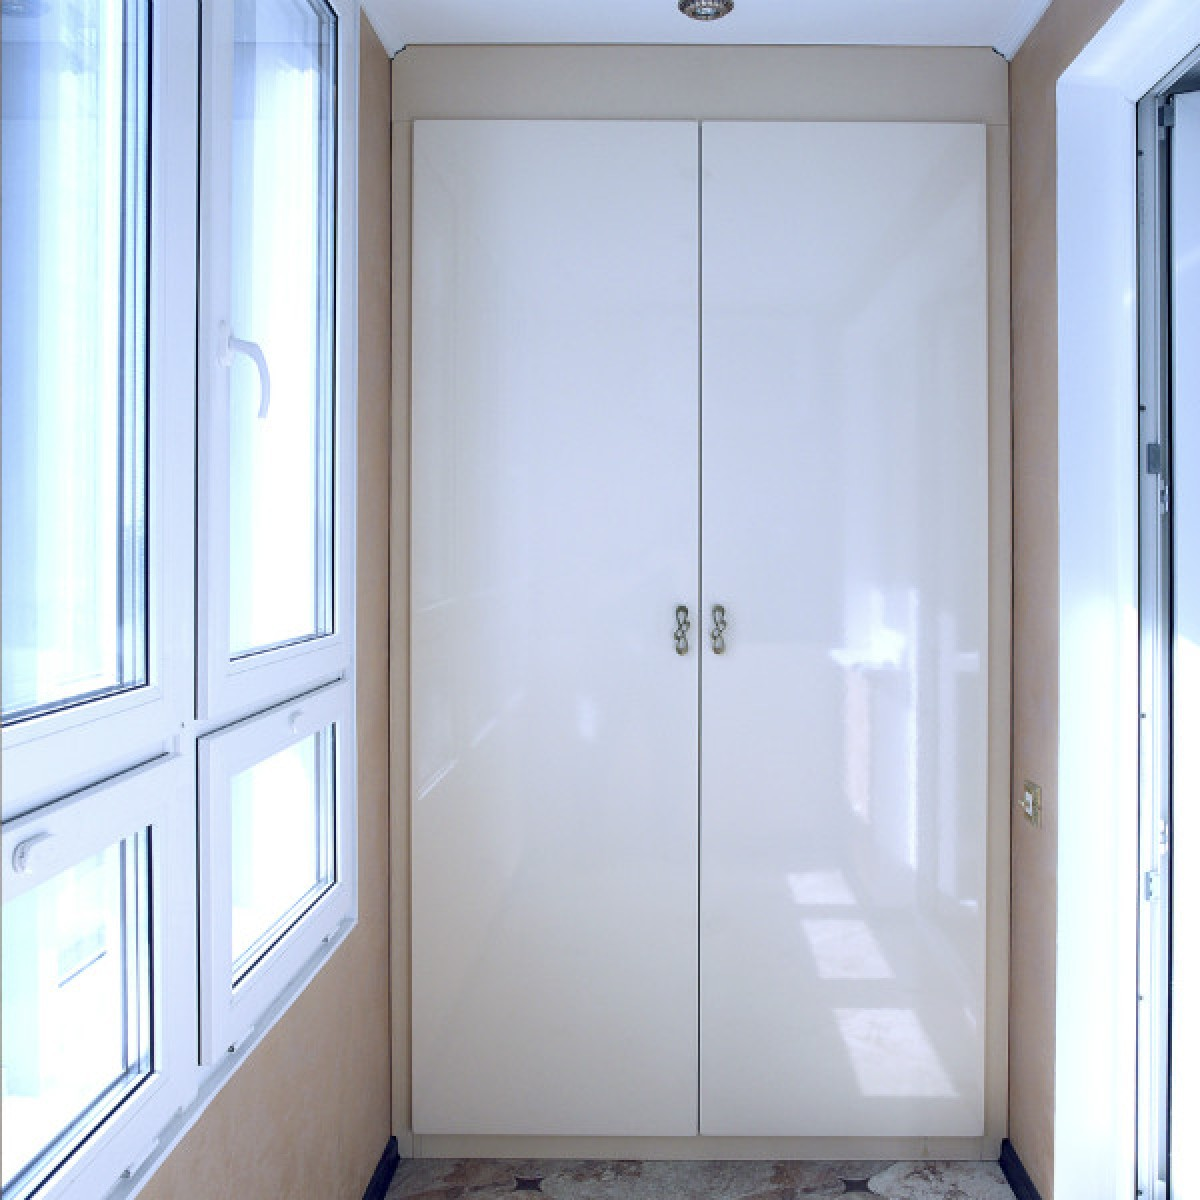 Двери распашные для шкафа на балконе на заказ.